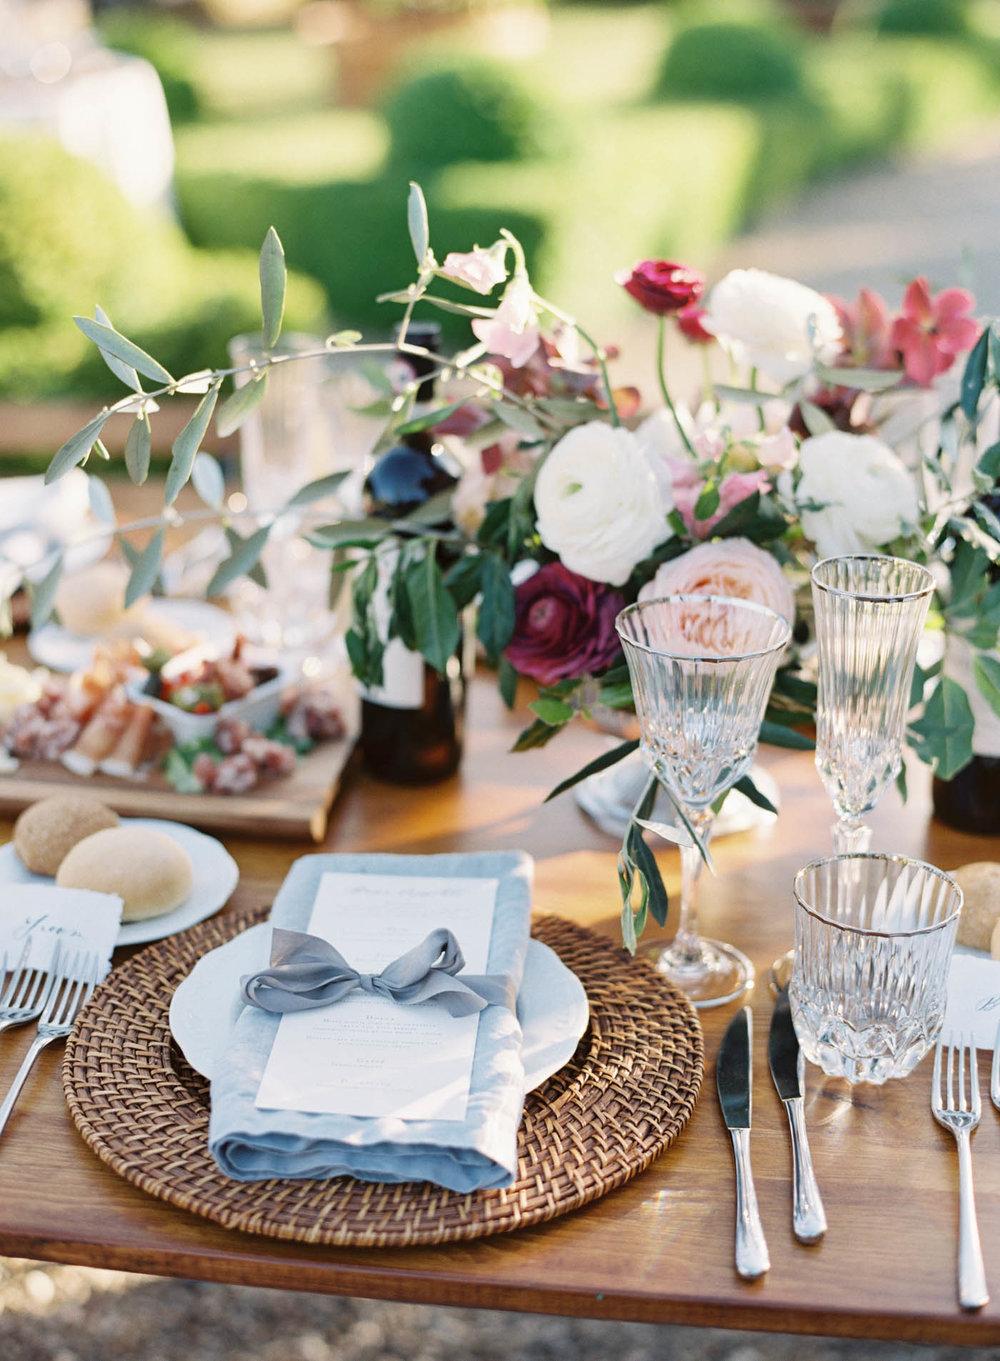 Villa_Cetinale_Wedding-45-Jen_Huang-ElanJacob-293-Jen_Huang-007319-R1-002.jpg